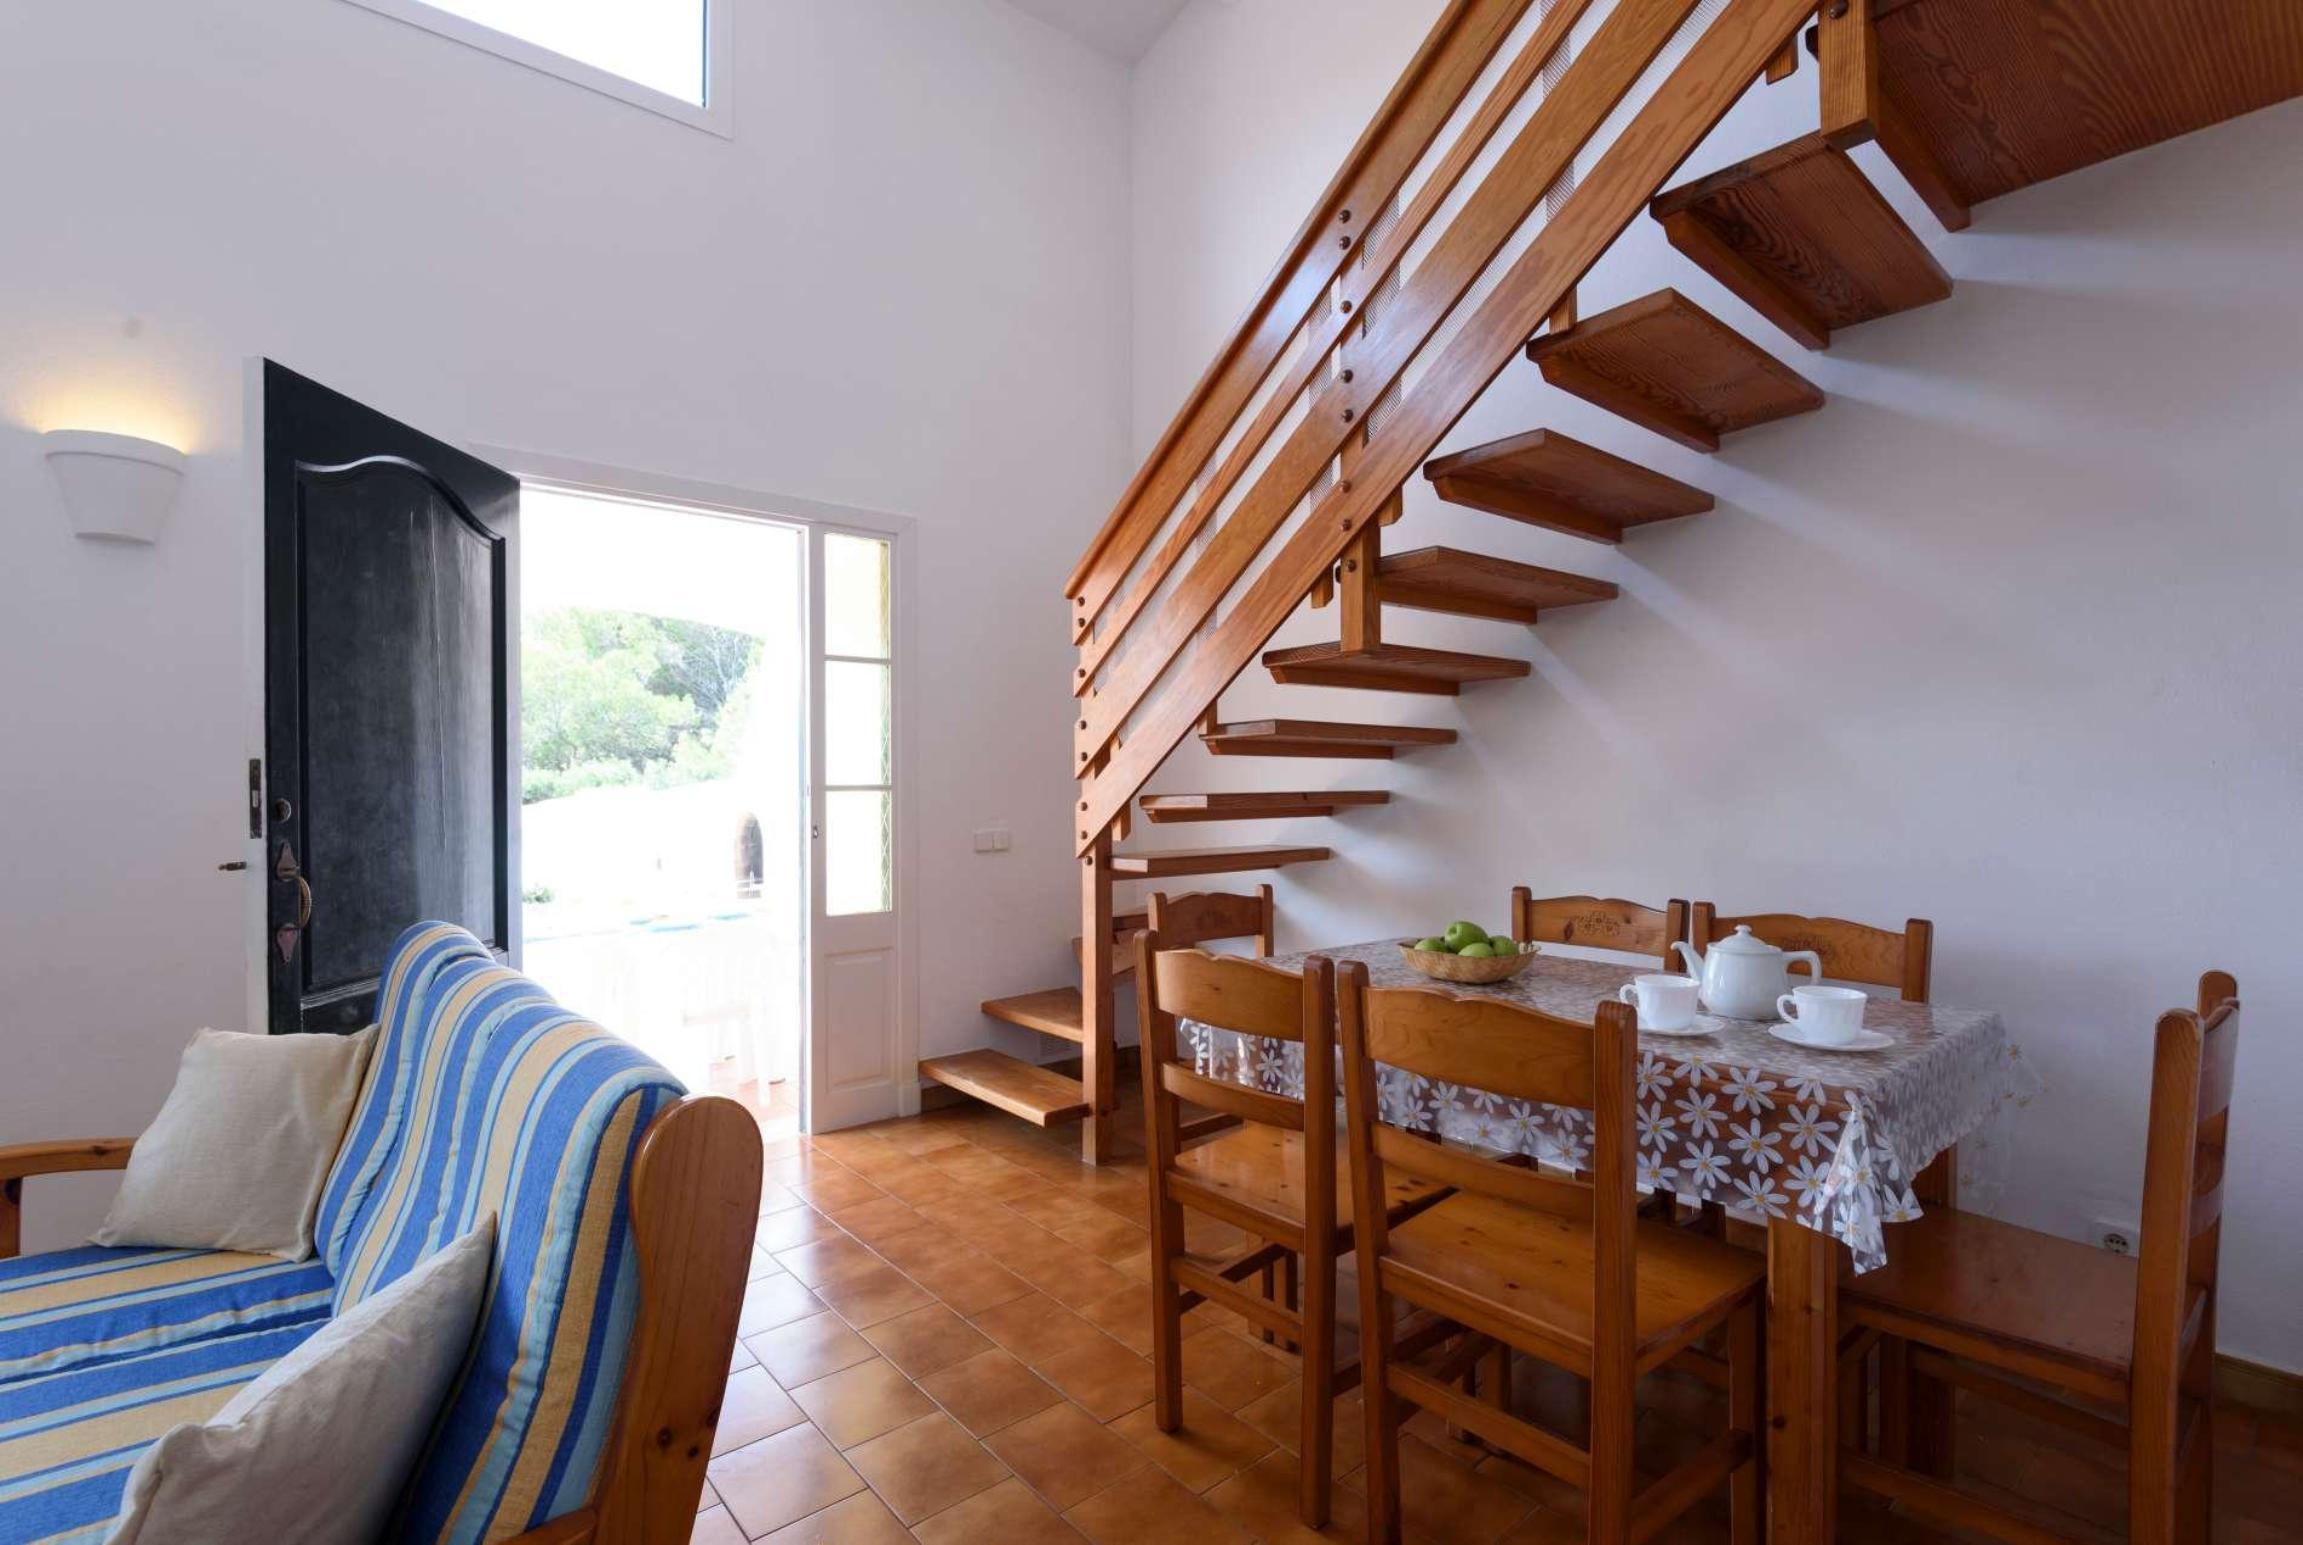 Ferienhaus Eulalia I (2653535), Arenal De'N Castell, Menorca, Balearische Inseln, Spanien, Bild 21